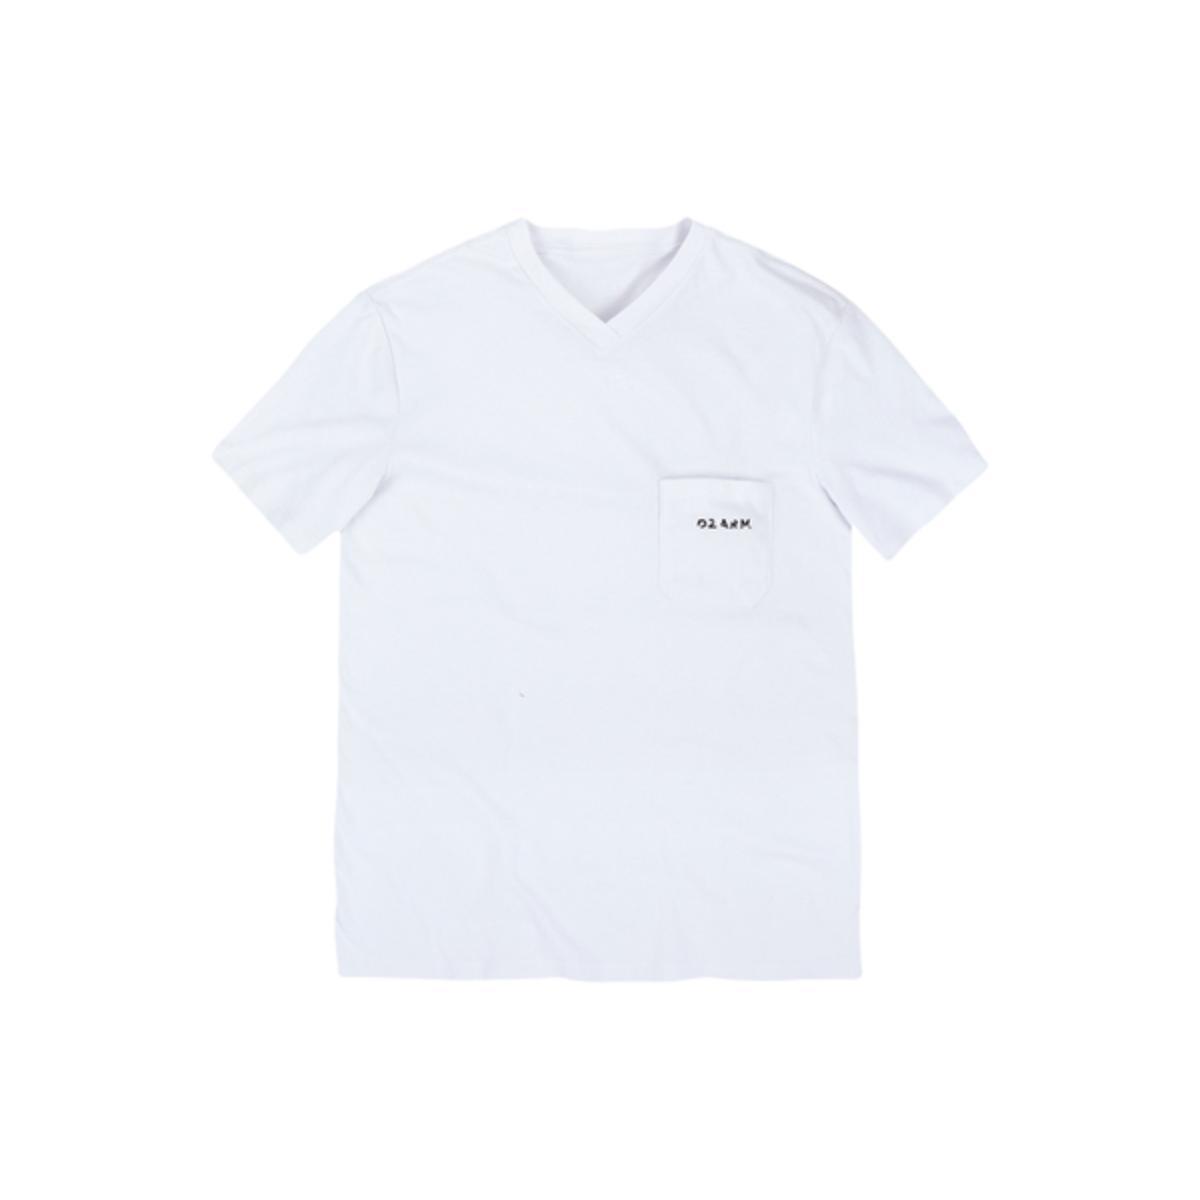 Camiseta Masculina Dzarm 6rmd N0aen Branco